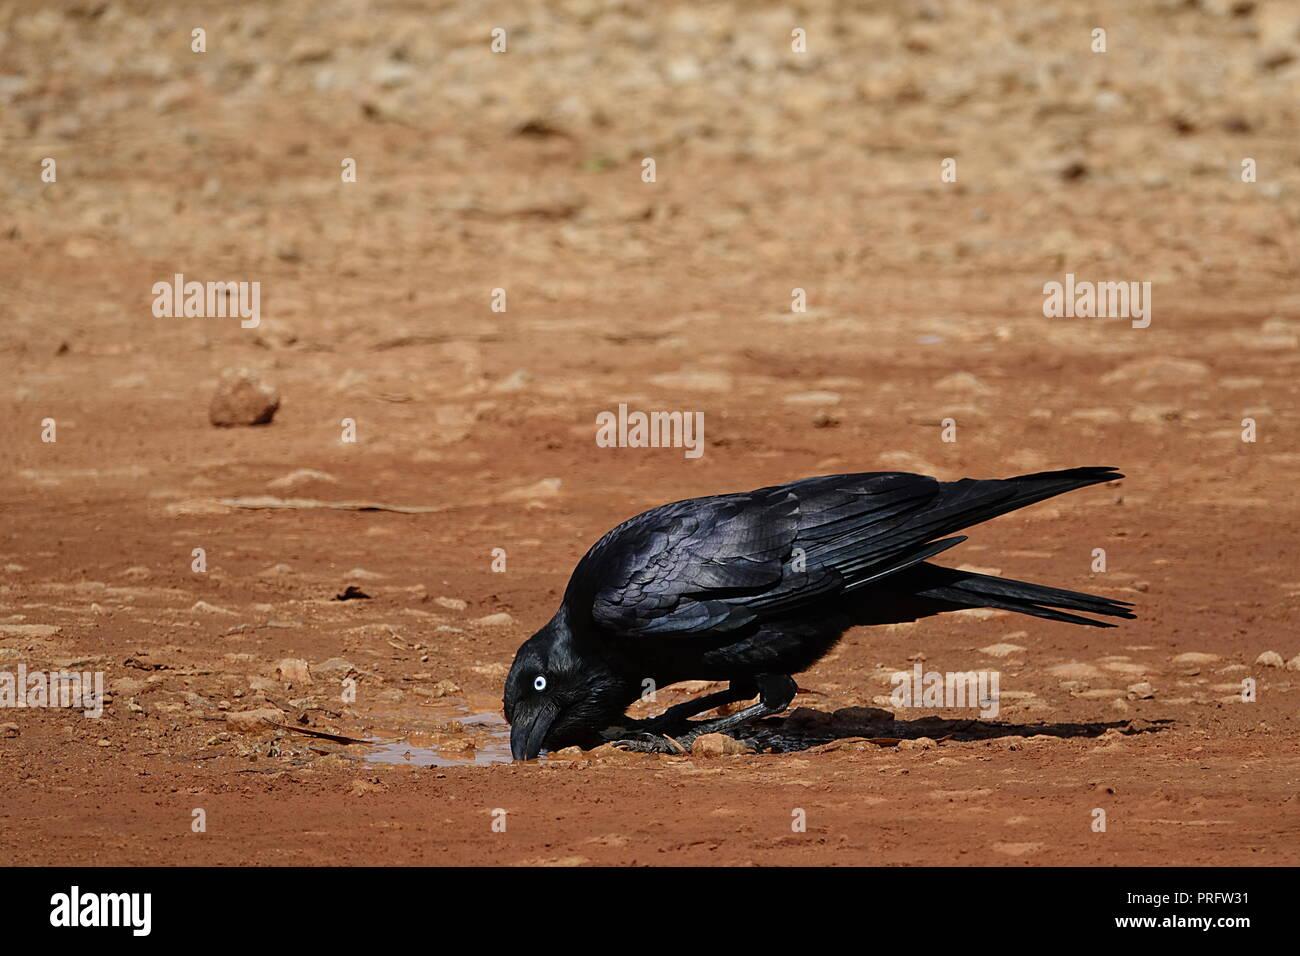 Australian raven, Corvus coronoides, Archer River, Cape York, Far North Queensland, Australia - Stock Image